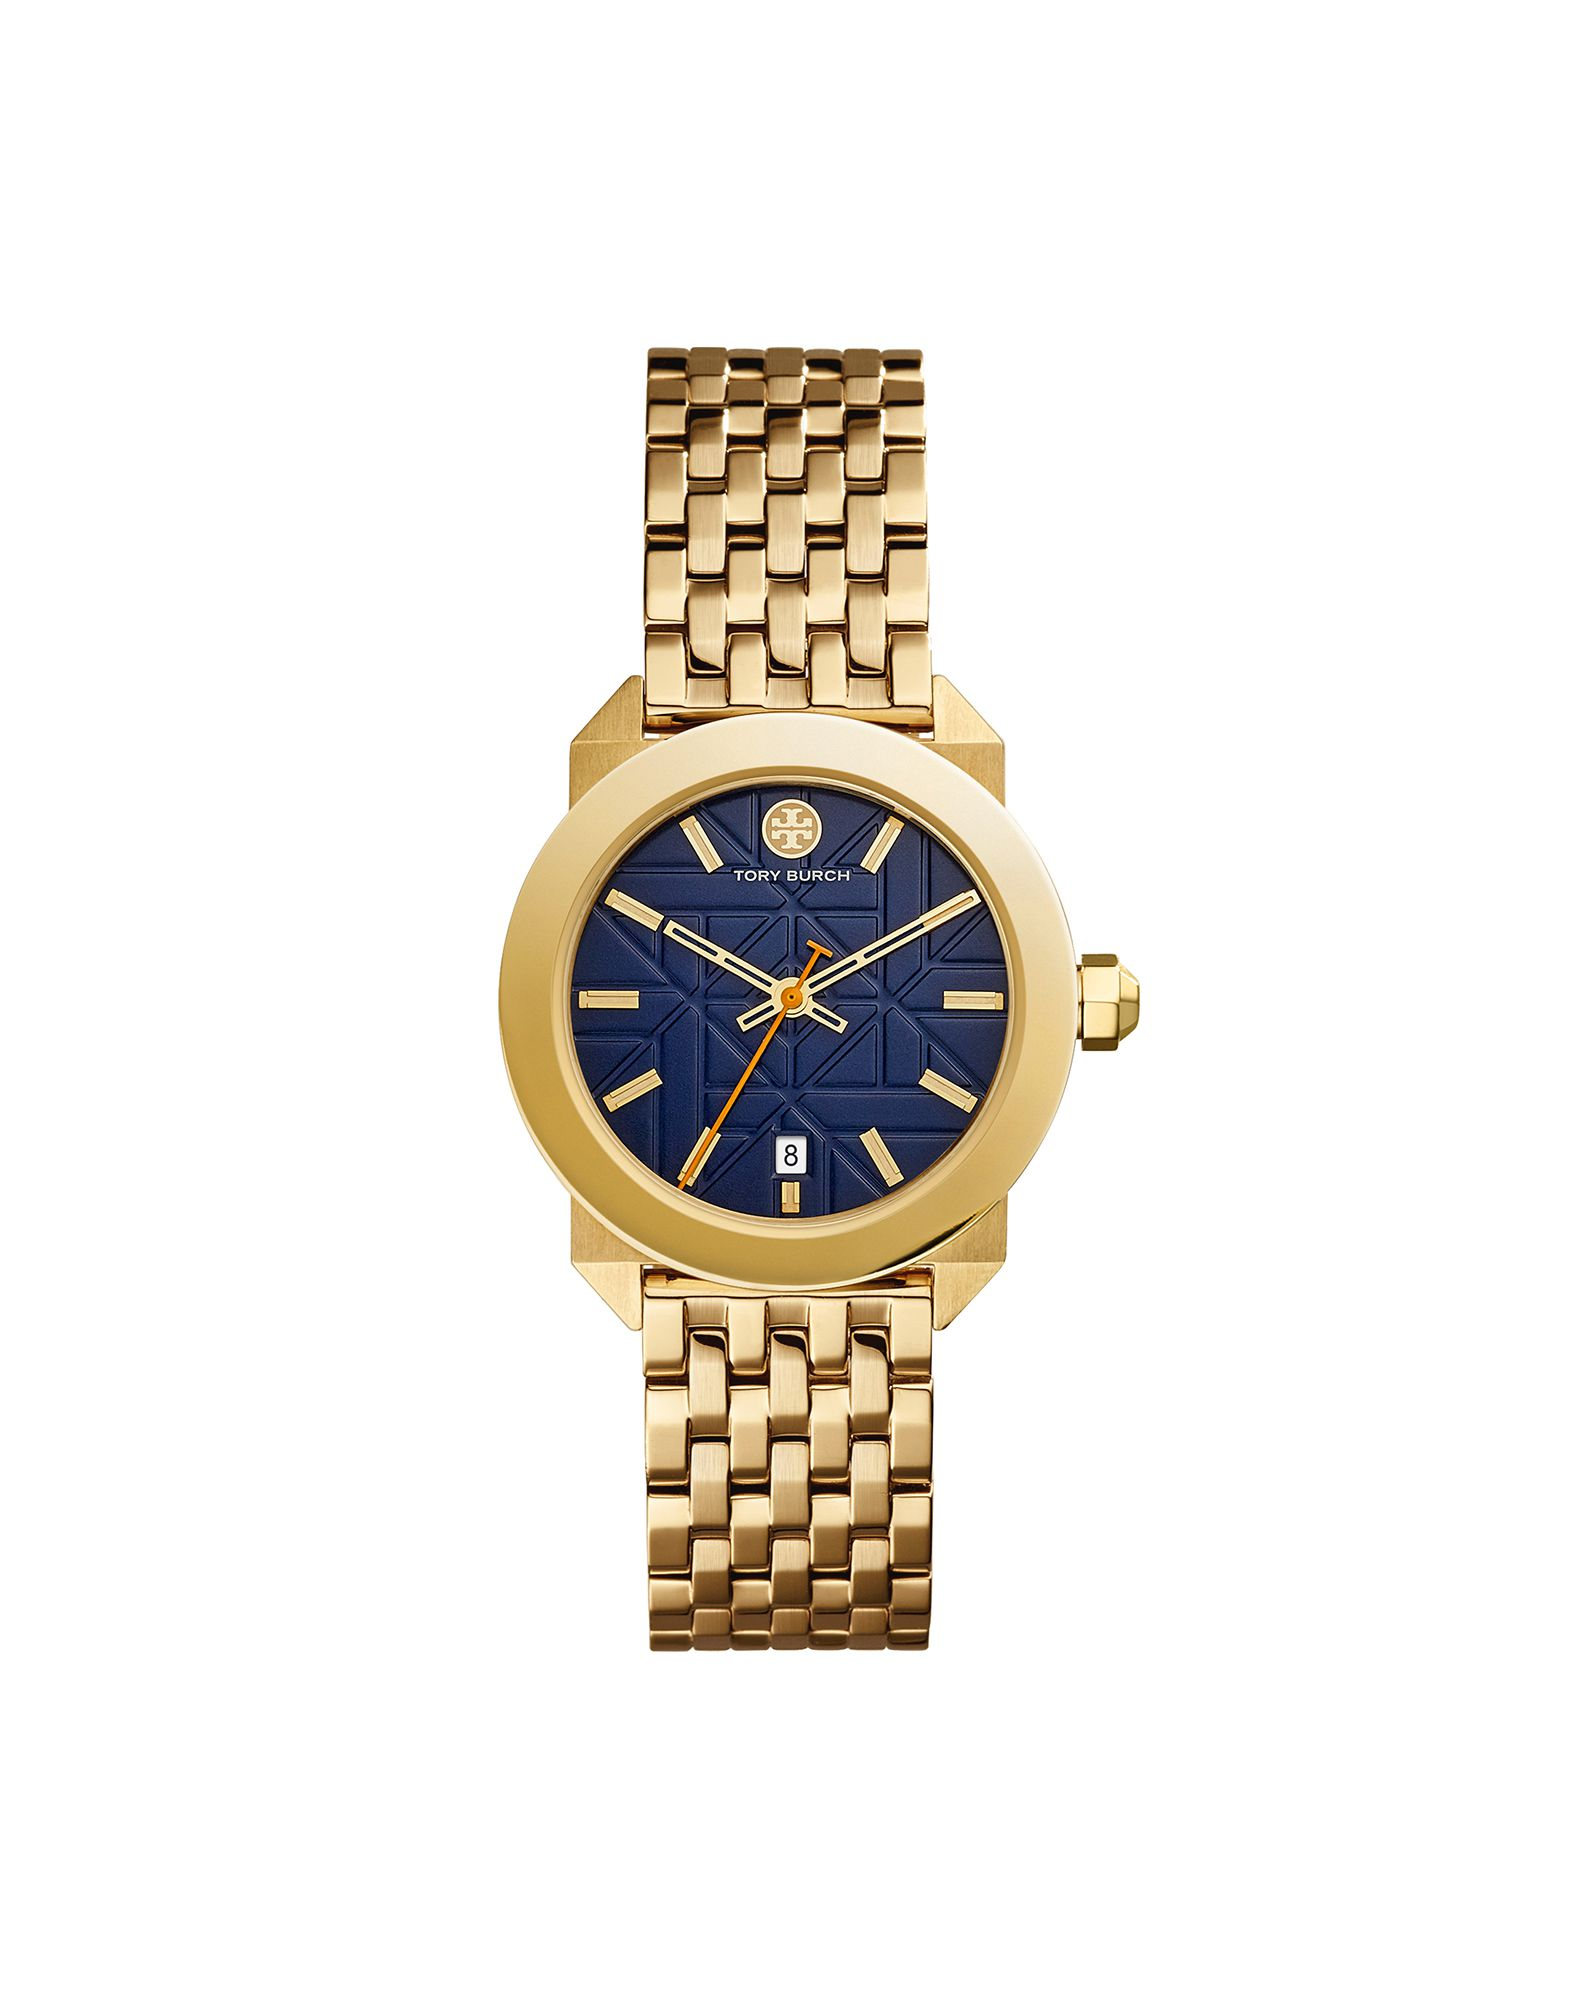 TORY BURCH Damen Armbanduhr Farbe Gold Größe 1 jetztbilligerkaufen